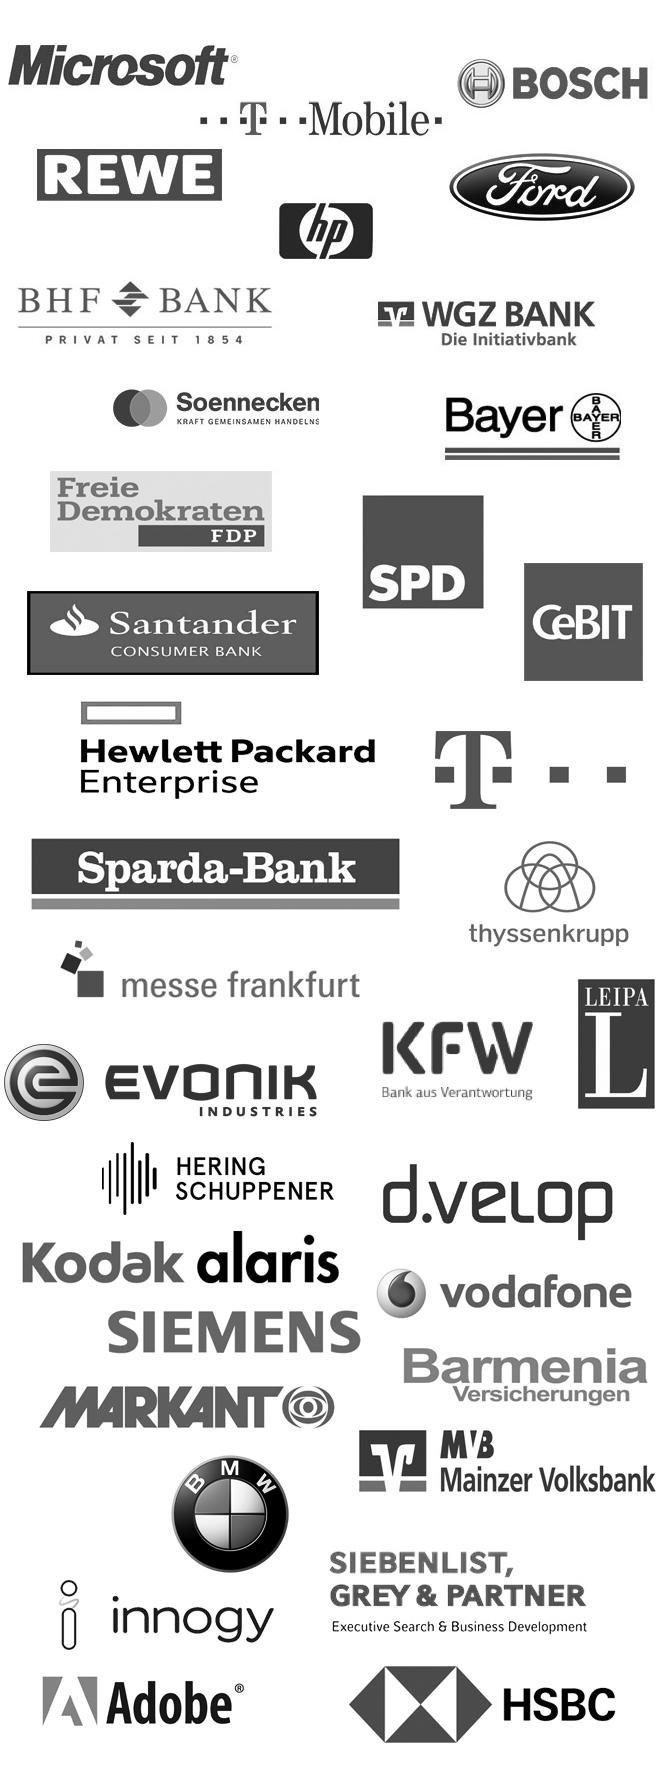 TELEKOM, MICROSOFT, BOSCH, REWE, FORD, HEWLETT-PACKARD, BHF BANK, T-MOBILE, WGZ BANK, NRW.BANK, SOENNECKEN, BAYER, FDP, SPD, CeBIT, SPARDA BANK, MESSE FRANKFURT, KREDITANSTALT FÜR WIEDERAUFBAU (KFW), THYSSENKRUPP, LEIPA, EVONIK INDUSTRIES